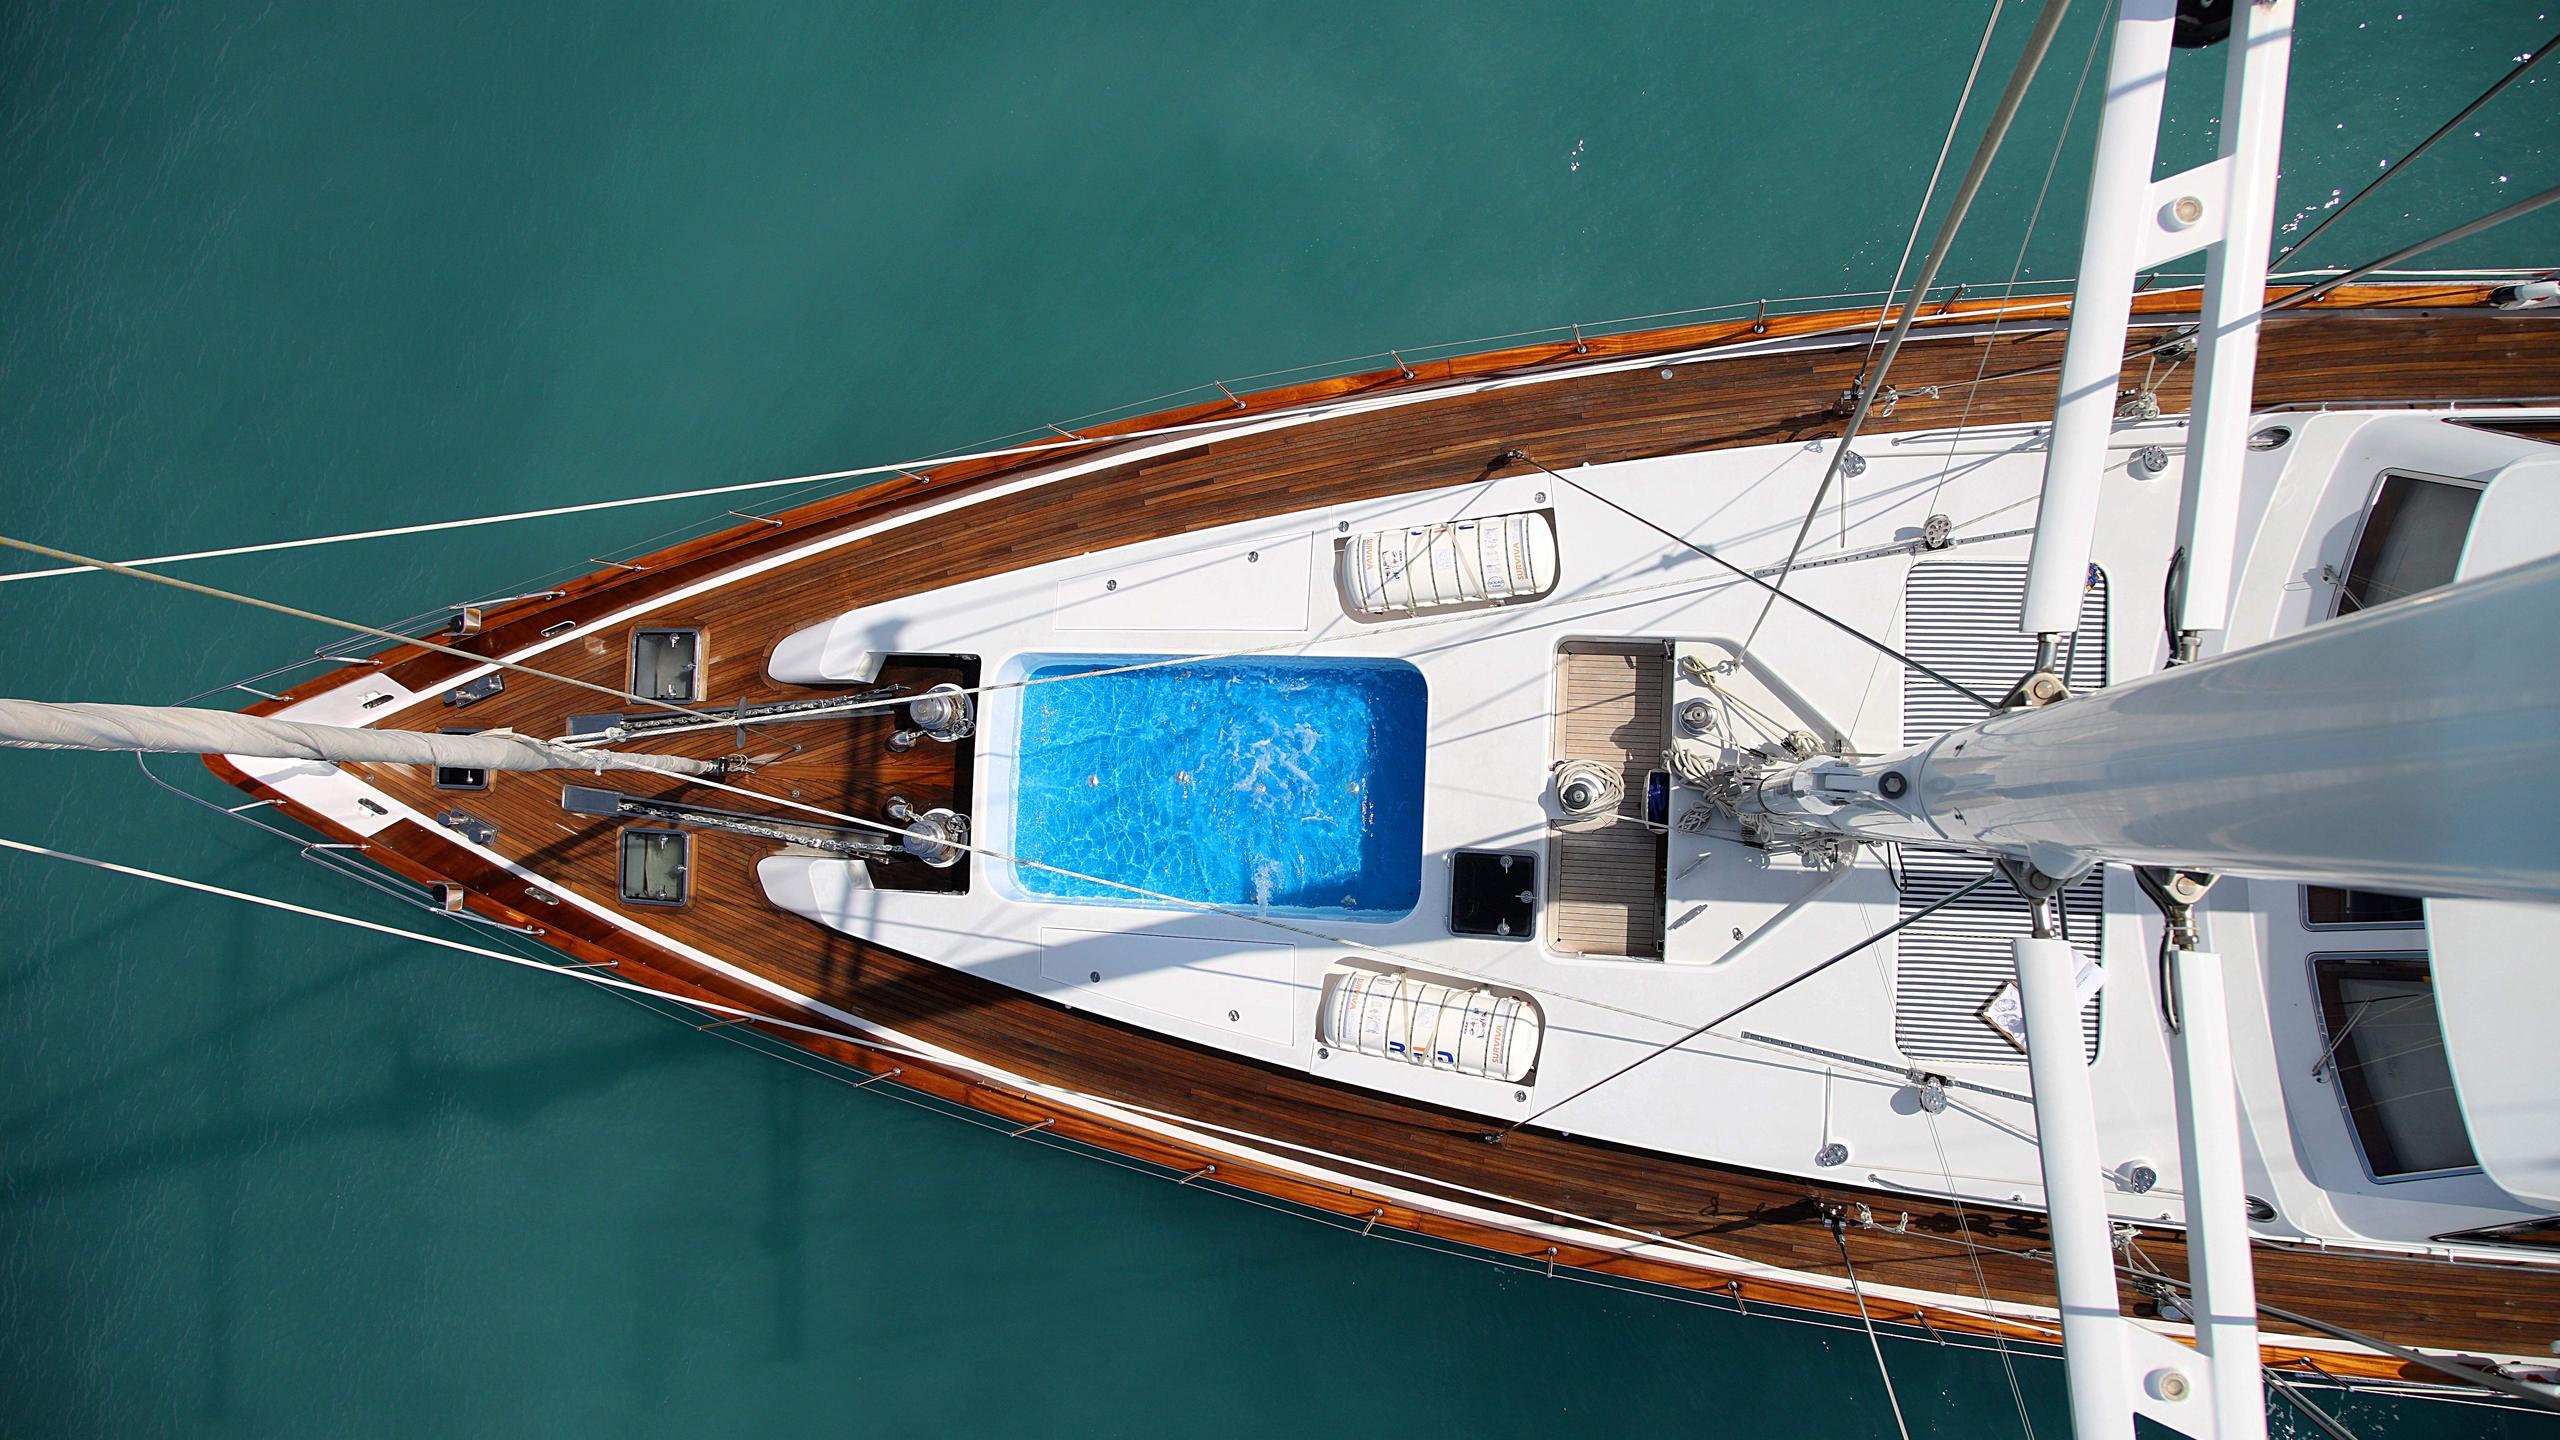 unplugged-sailing-yacht-valdettaro-112-1992-34m-aerila-foredeck